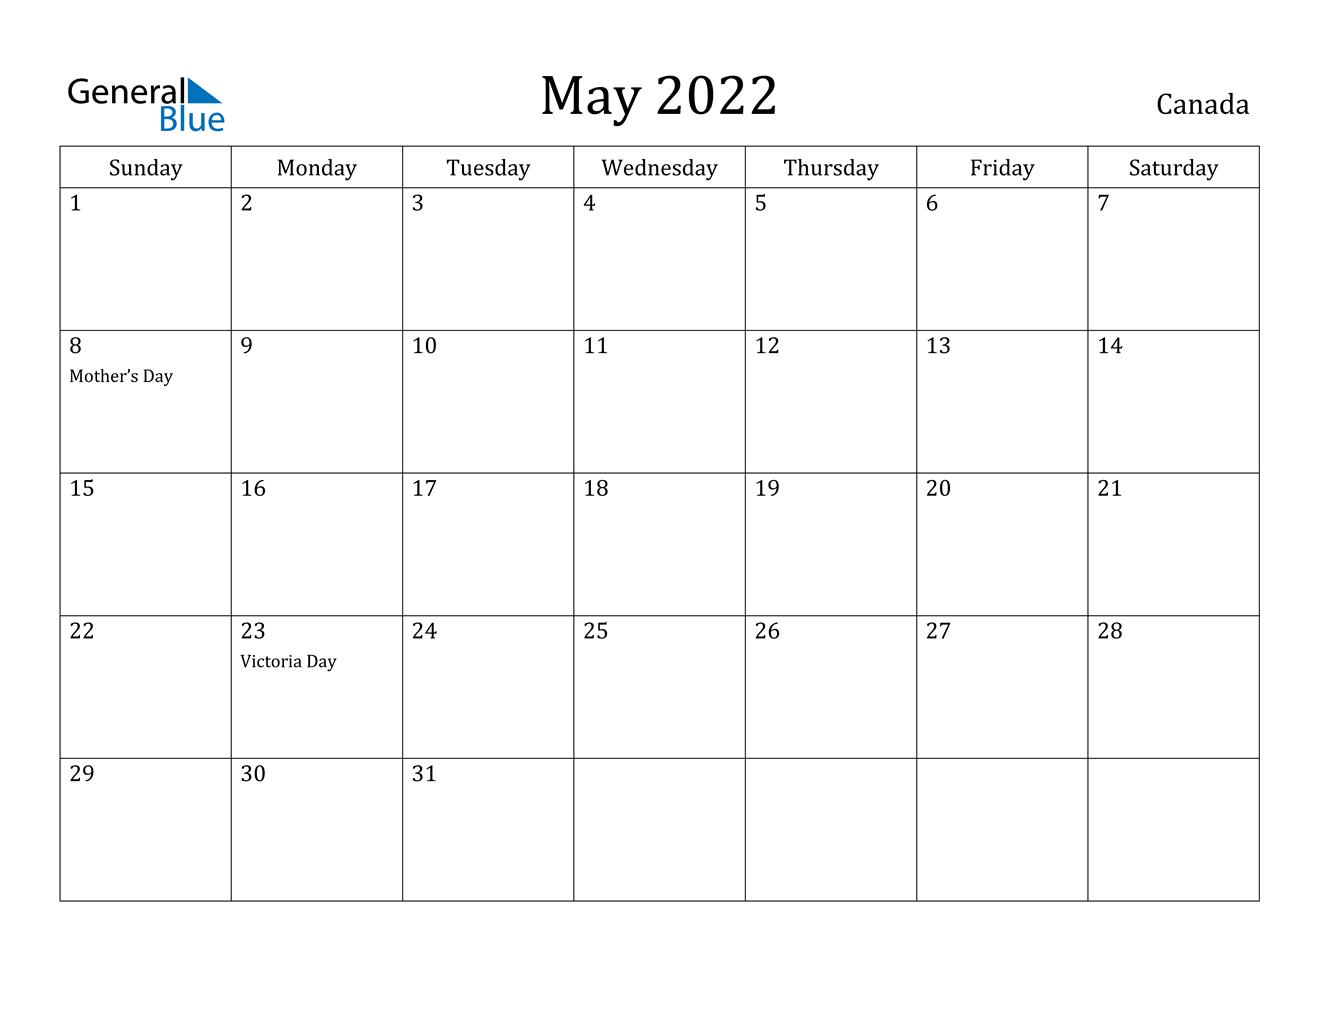 May 2022 Calendar - Canada with Printable Mayl 2022 Calendar